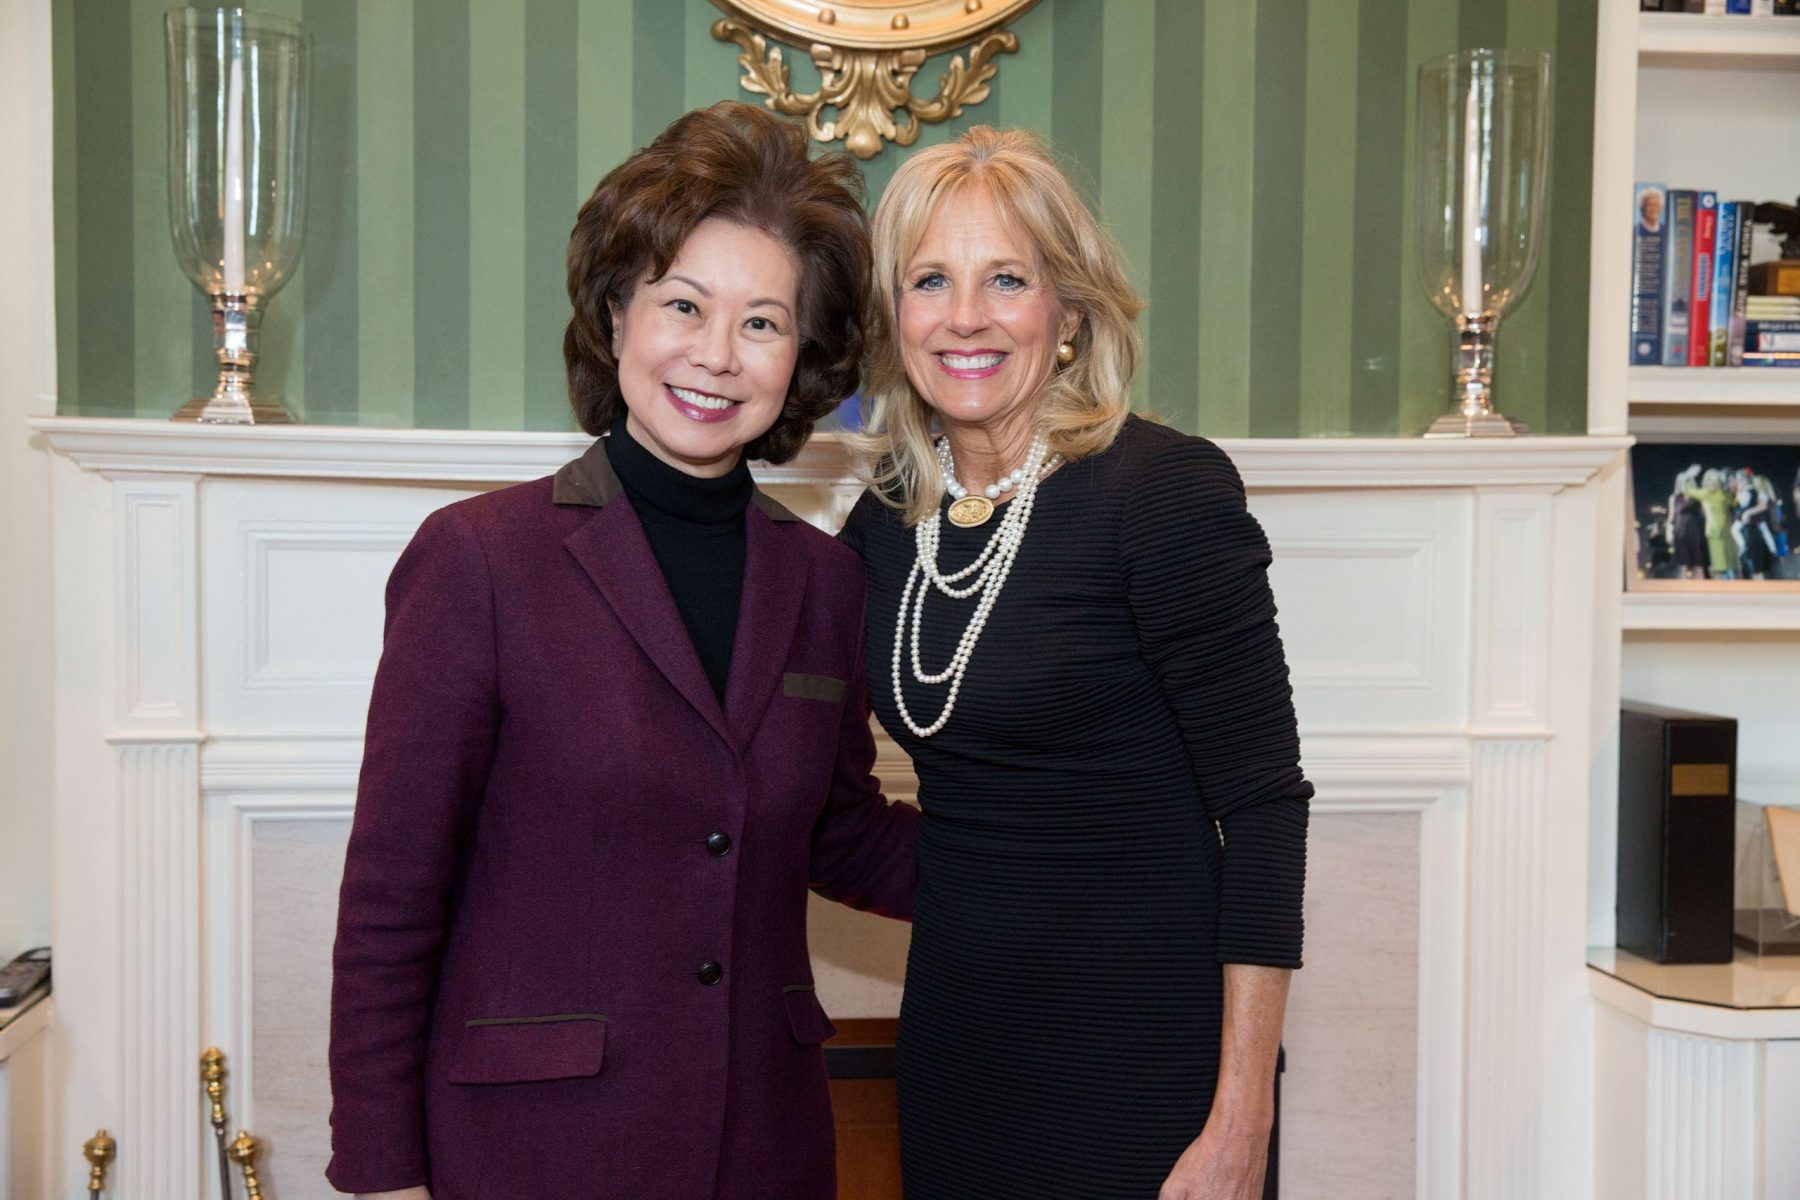 Secretary Elaine Chao with Dr. Jill Biden at the Vice President's residence. Washington, D.C.